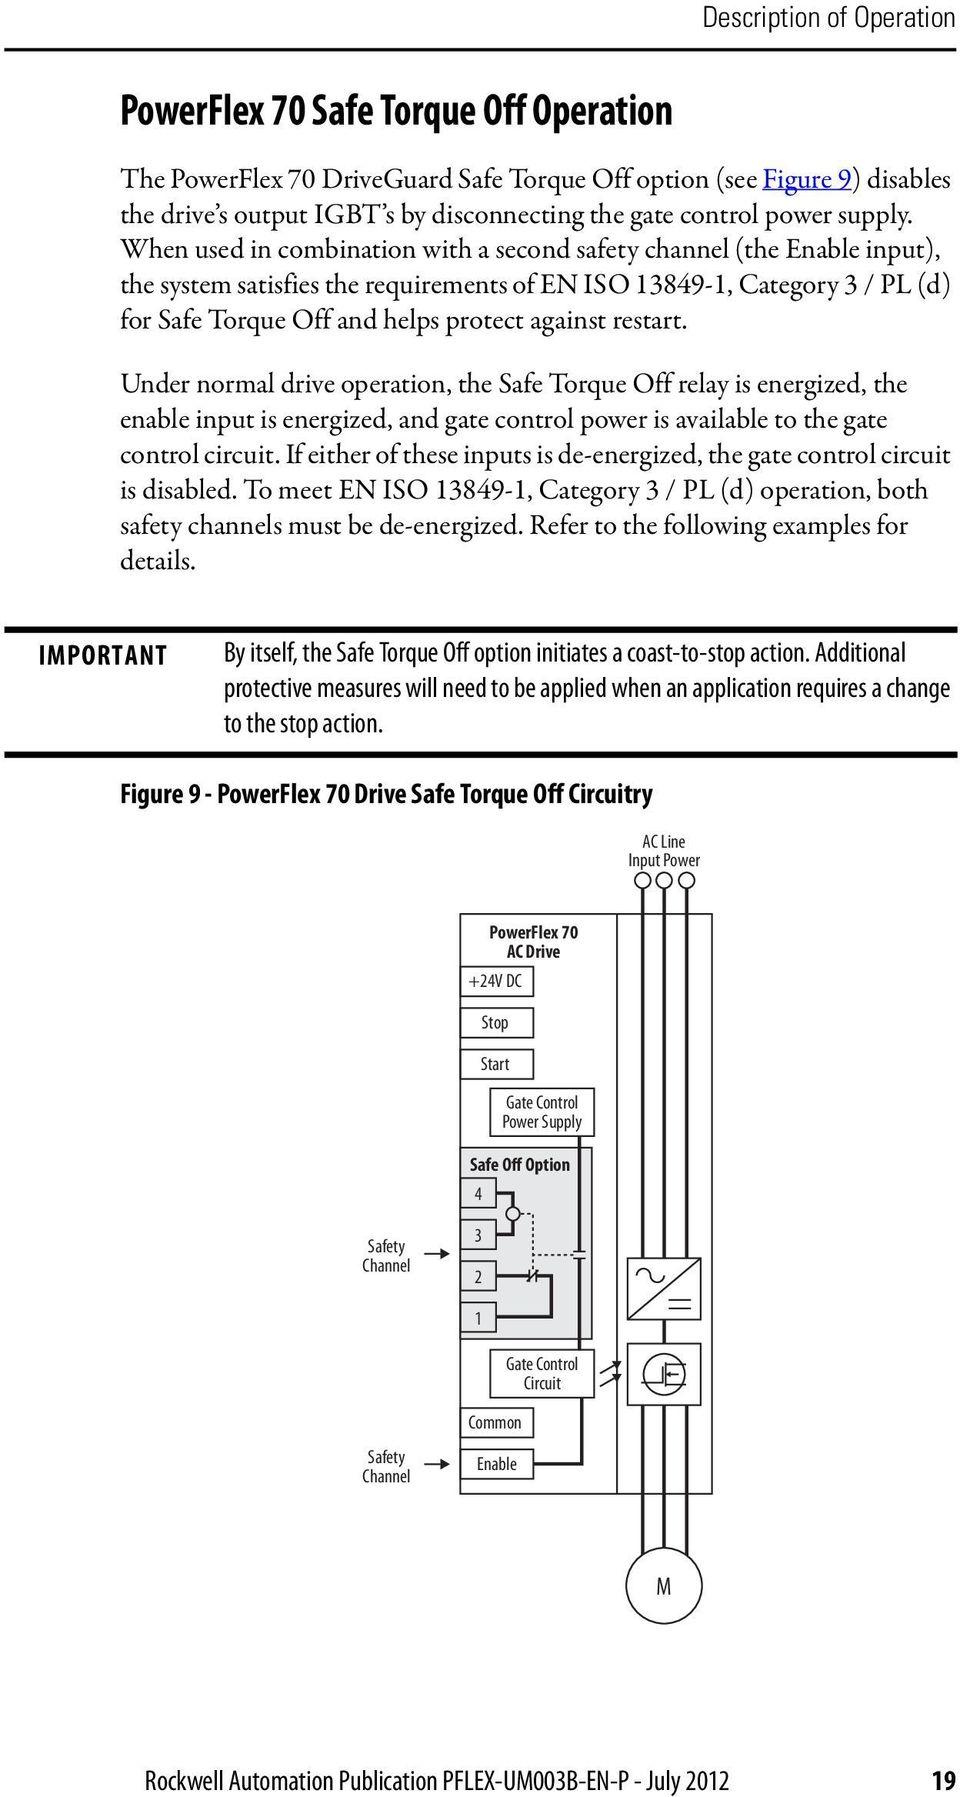 medium resolution of powerflex 70 safe off wiring diagram wiring diagram paper powerflex 70 safe off wiring diagram